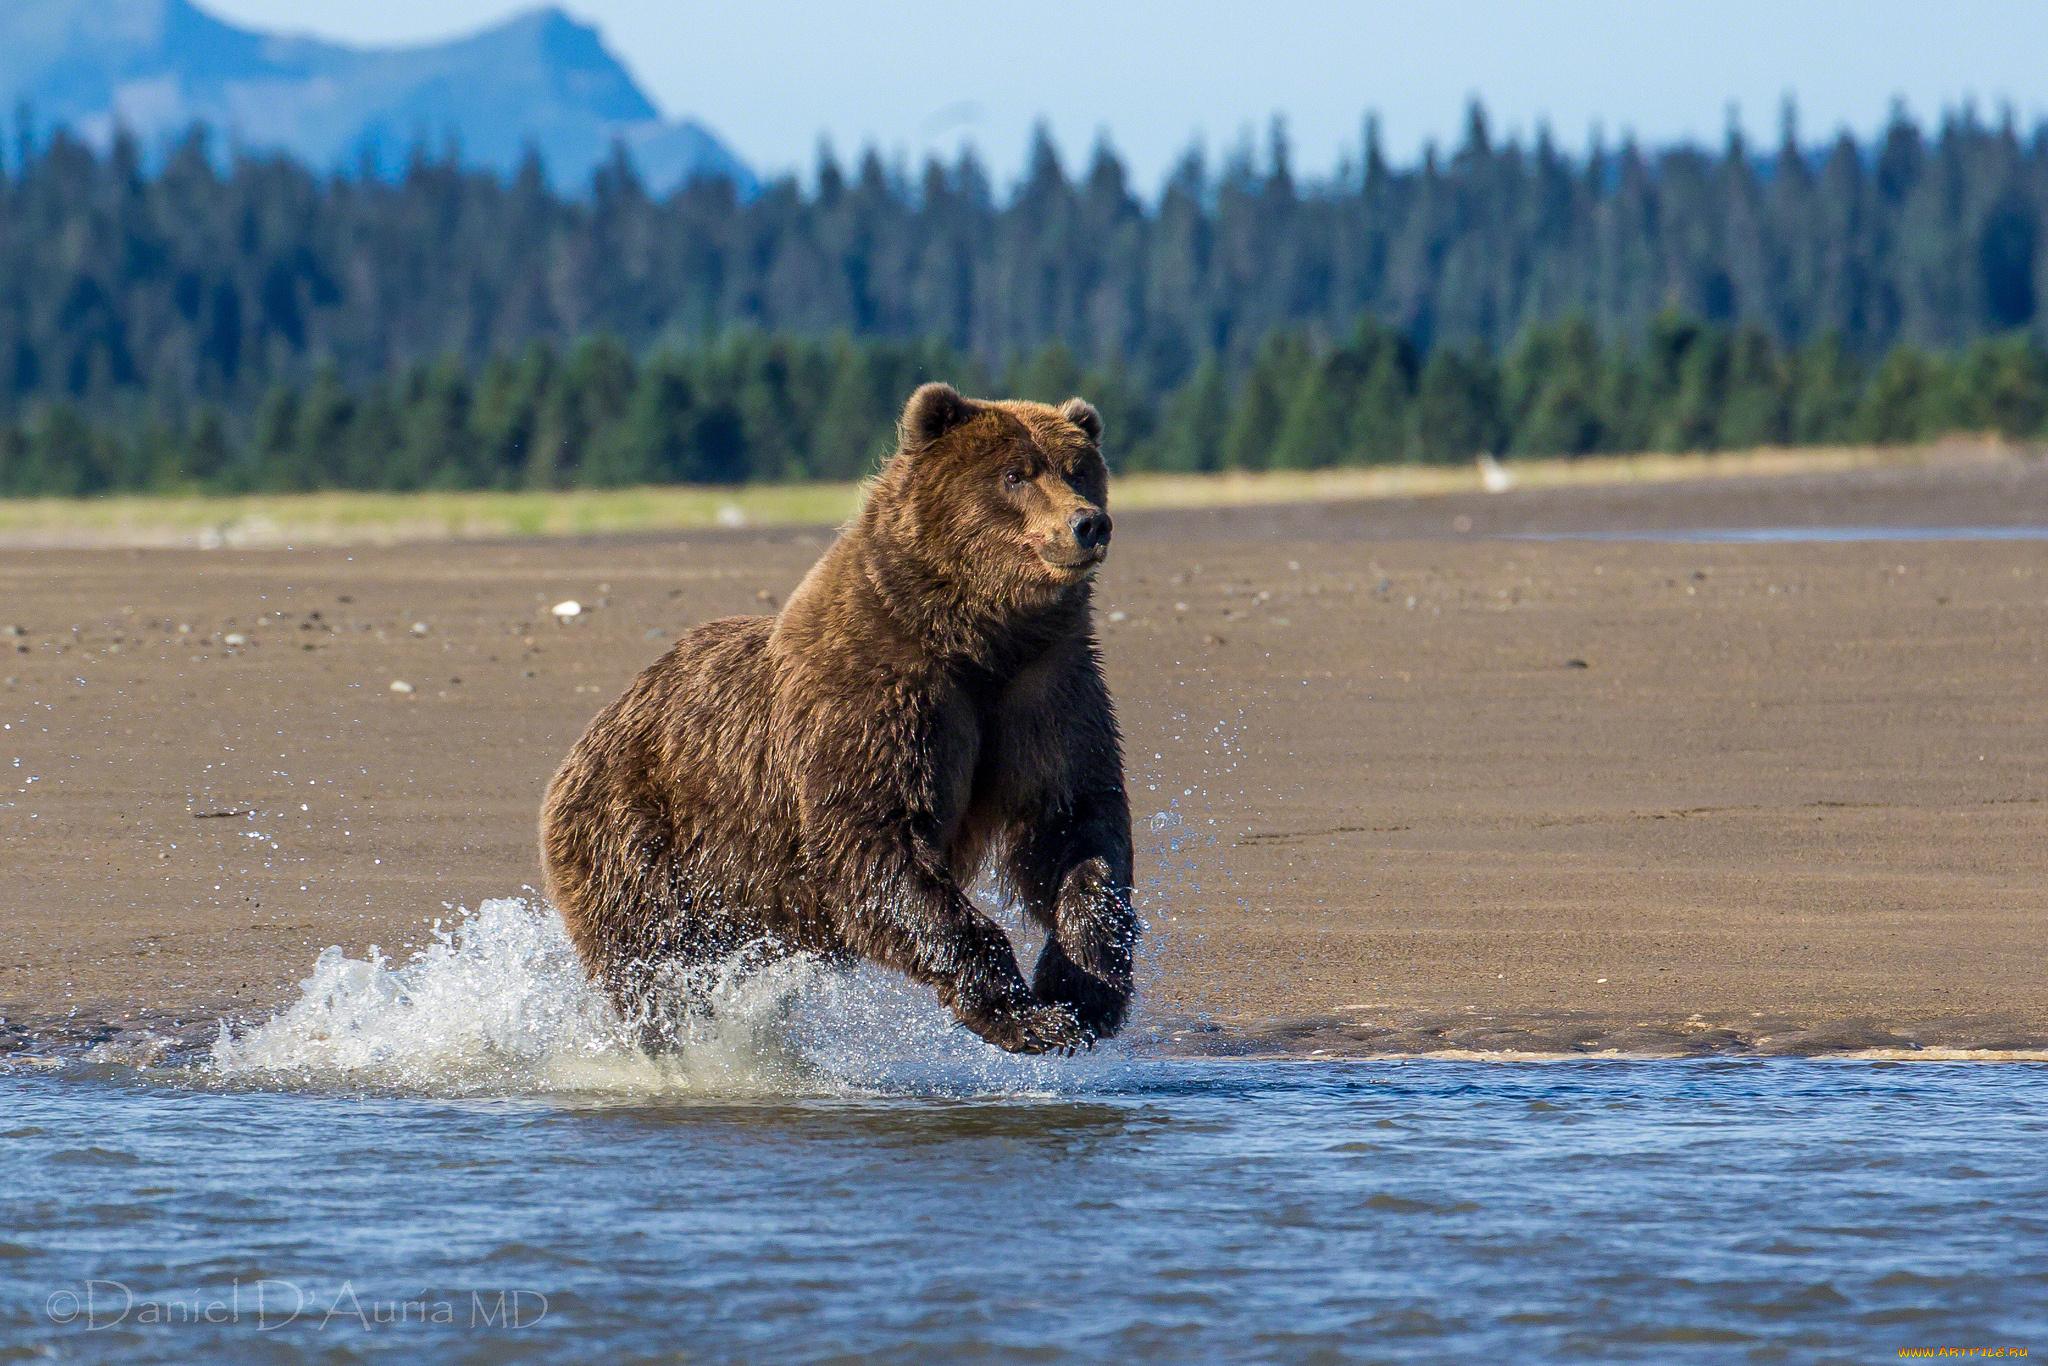 Alaskan Brown Bear Silhouetted Against Mount Katolinat, Alaska  № 1442566 загрузить